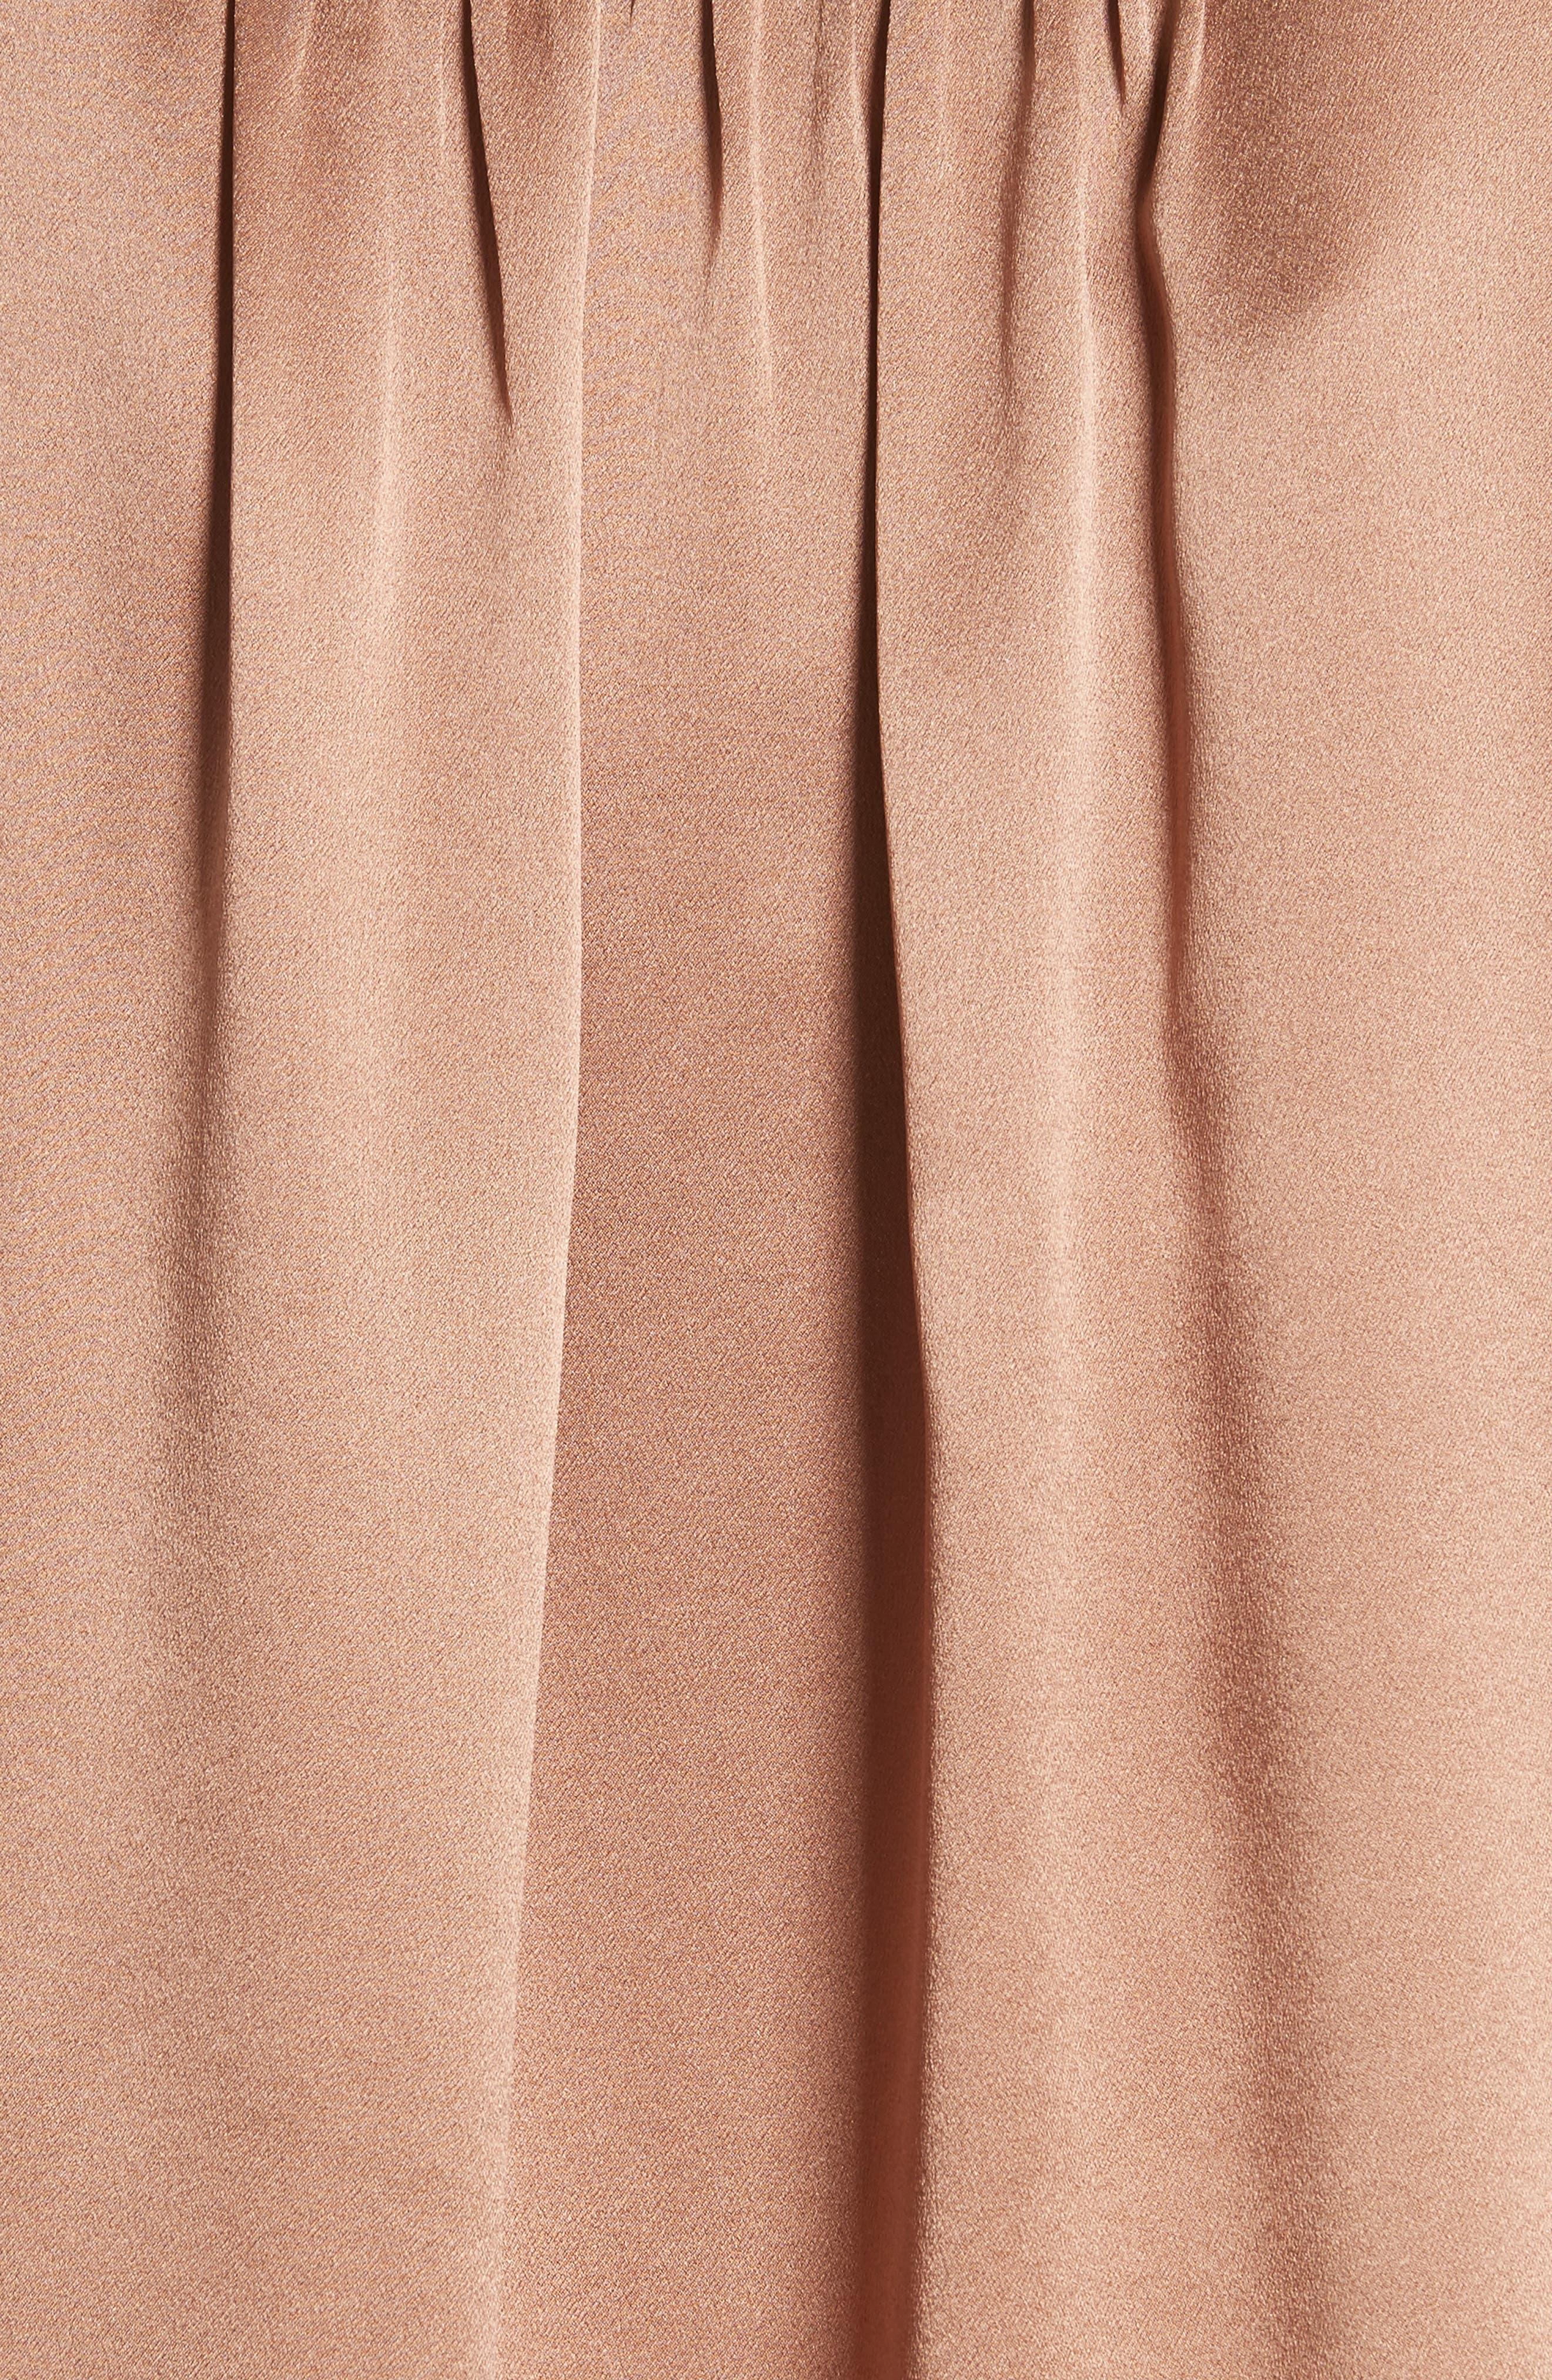 Shirred Silk Blouse,                             Alternate thumbnail 5, color,                             Tobacco